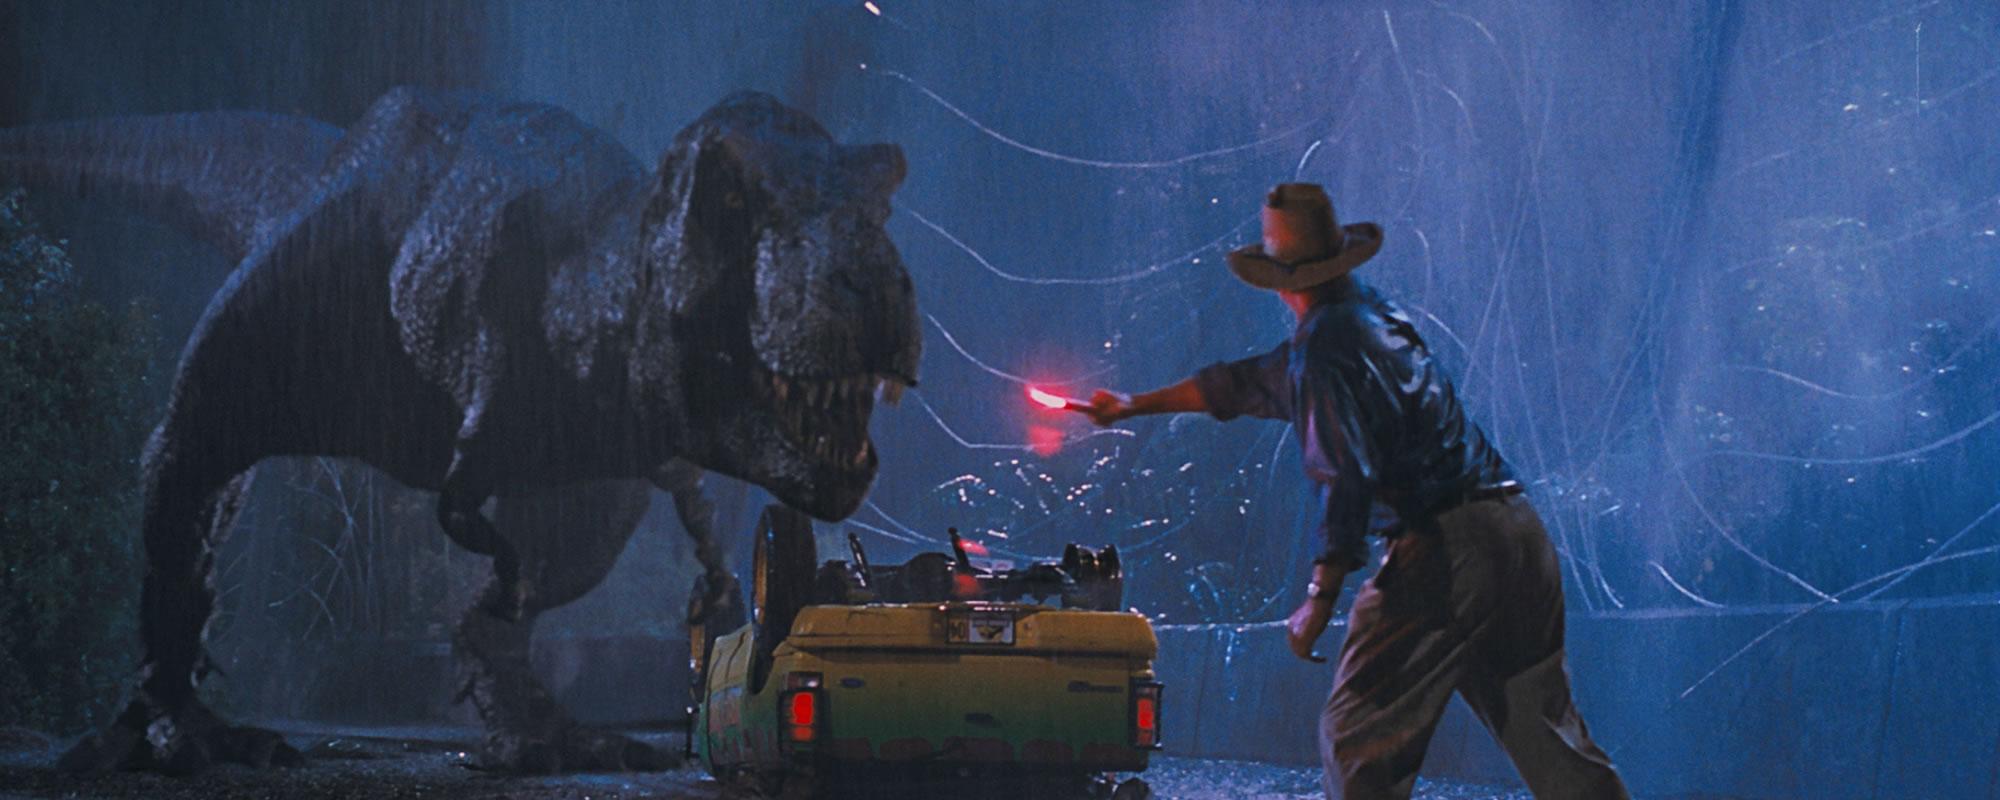 Jurassic-Park-2000x800px.jpg